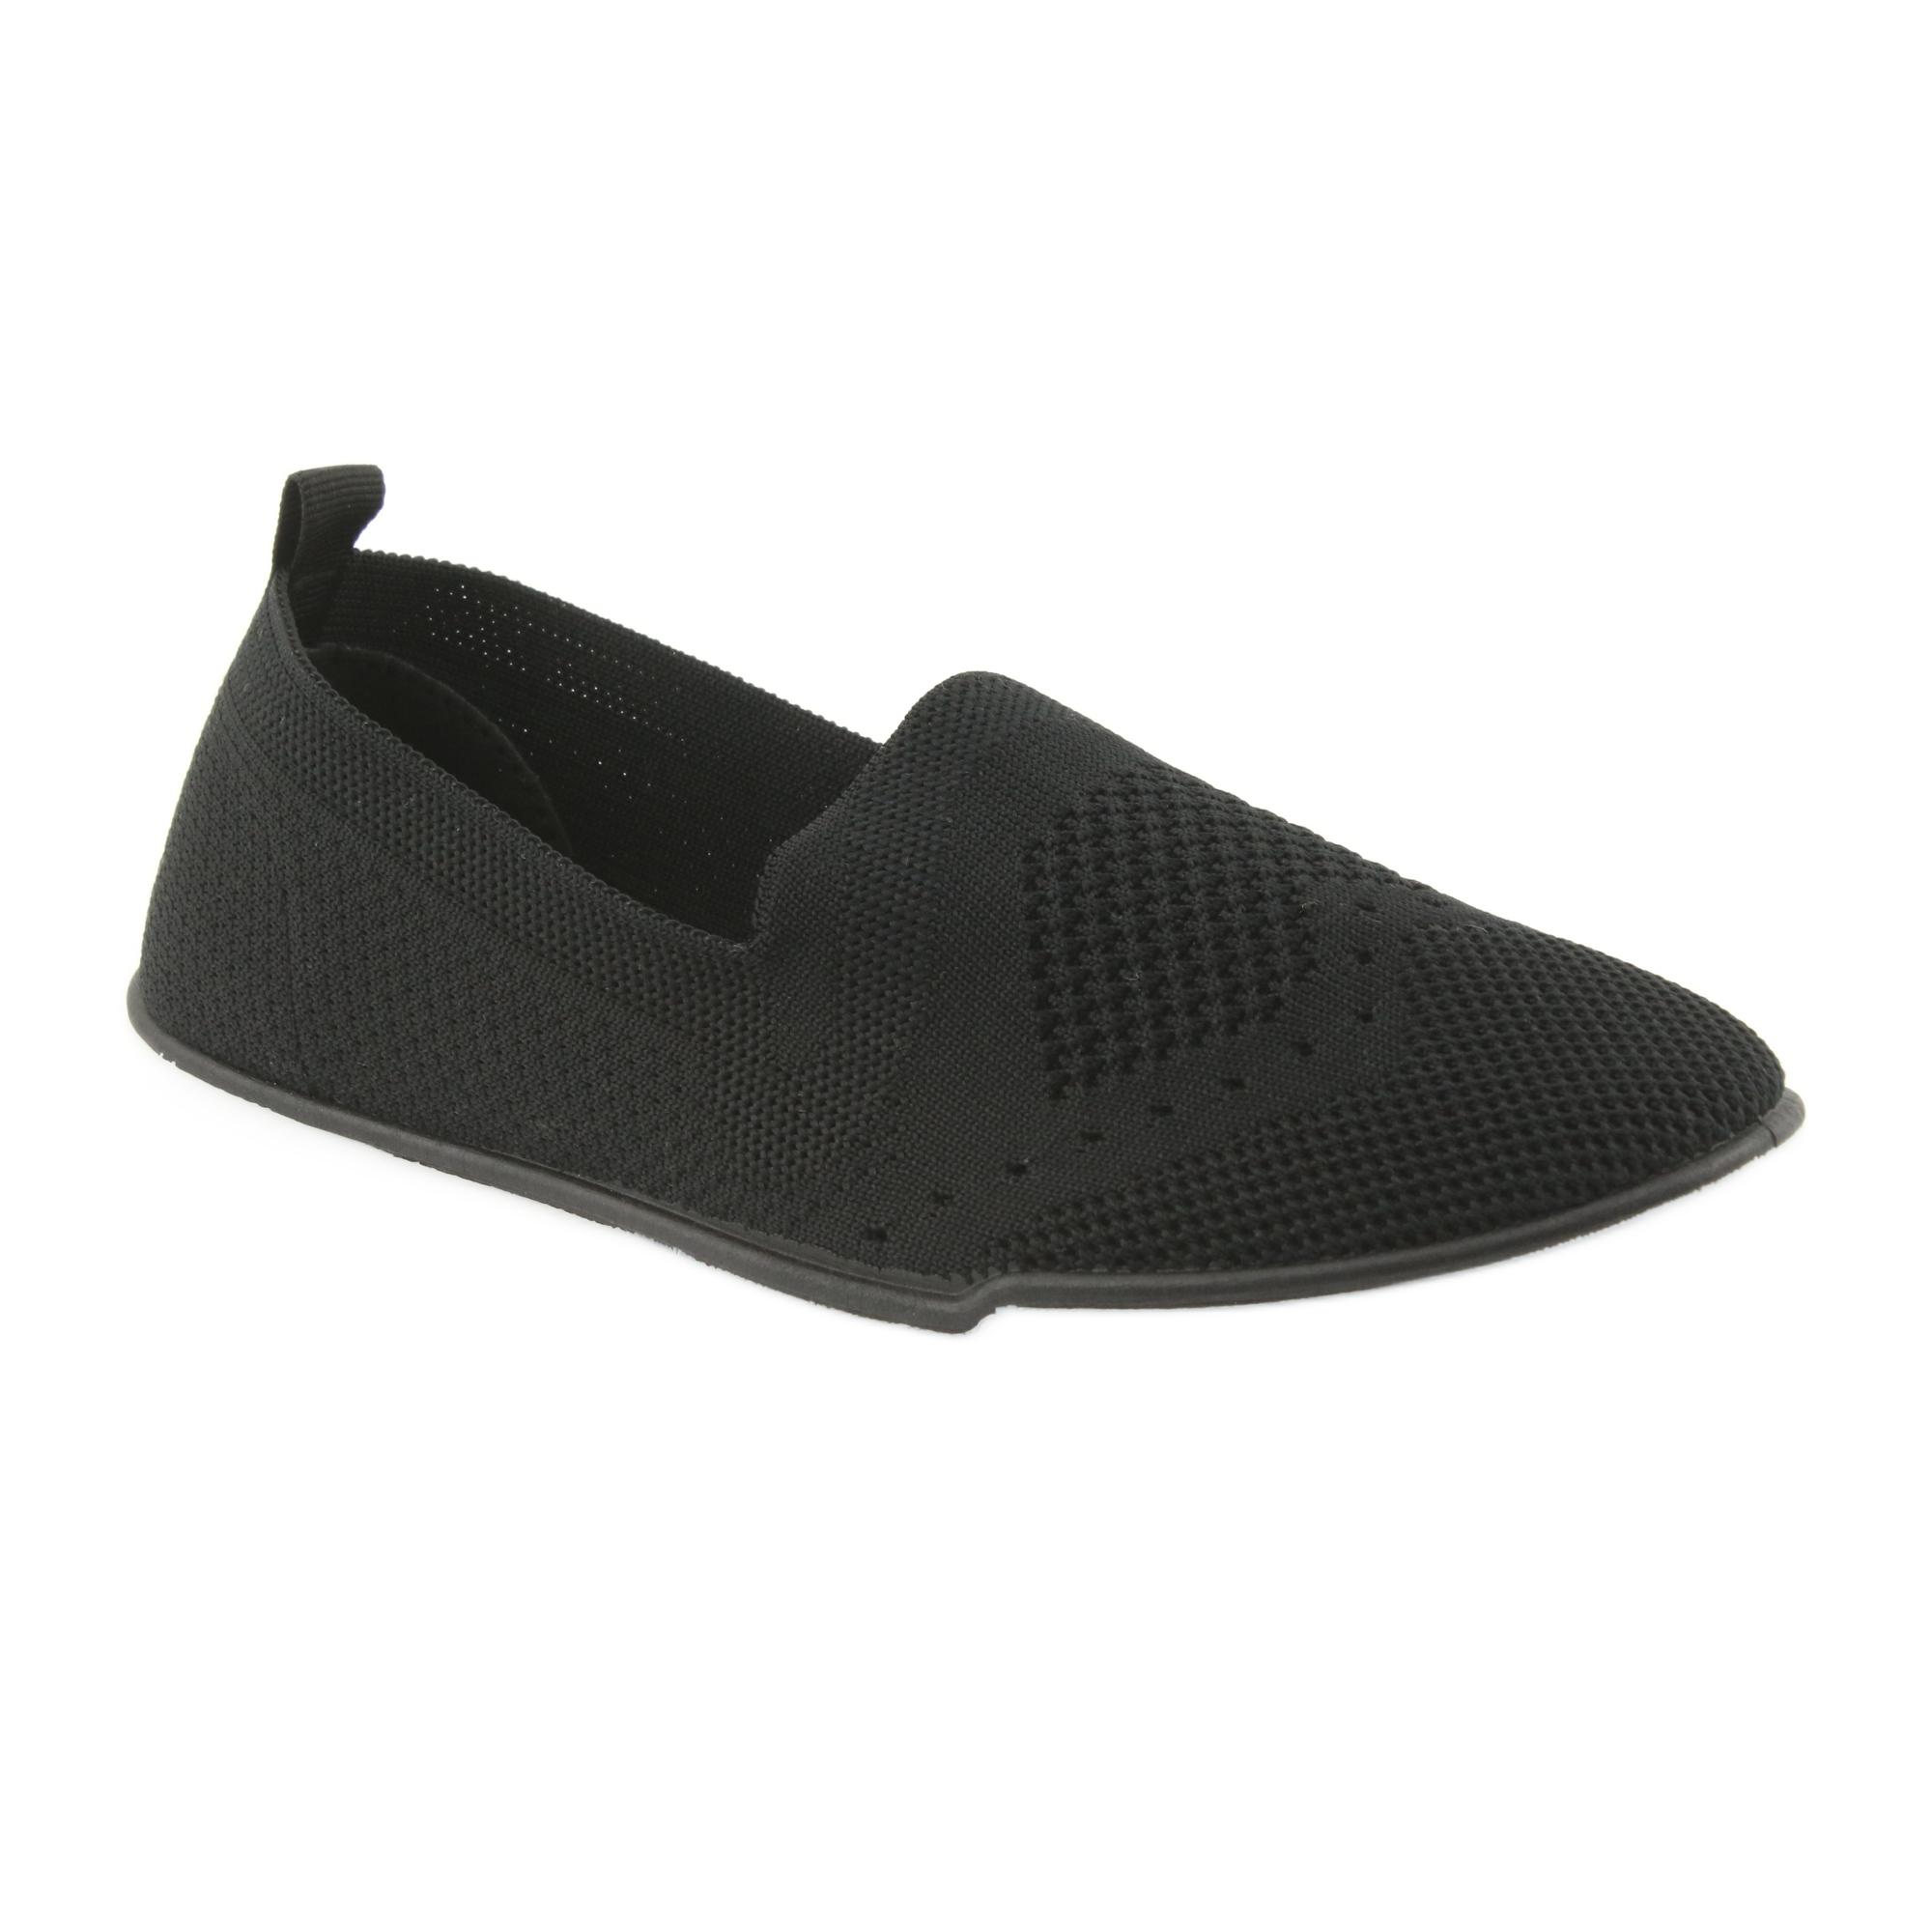 Butymodne Baskets Noires Mckey pl Sneakers 3R4j5AqL